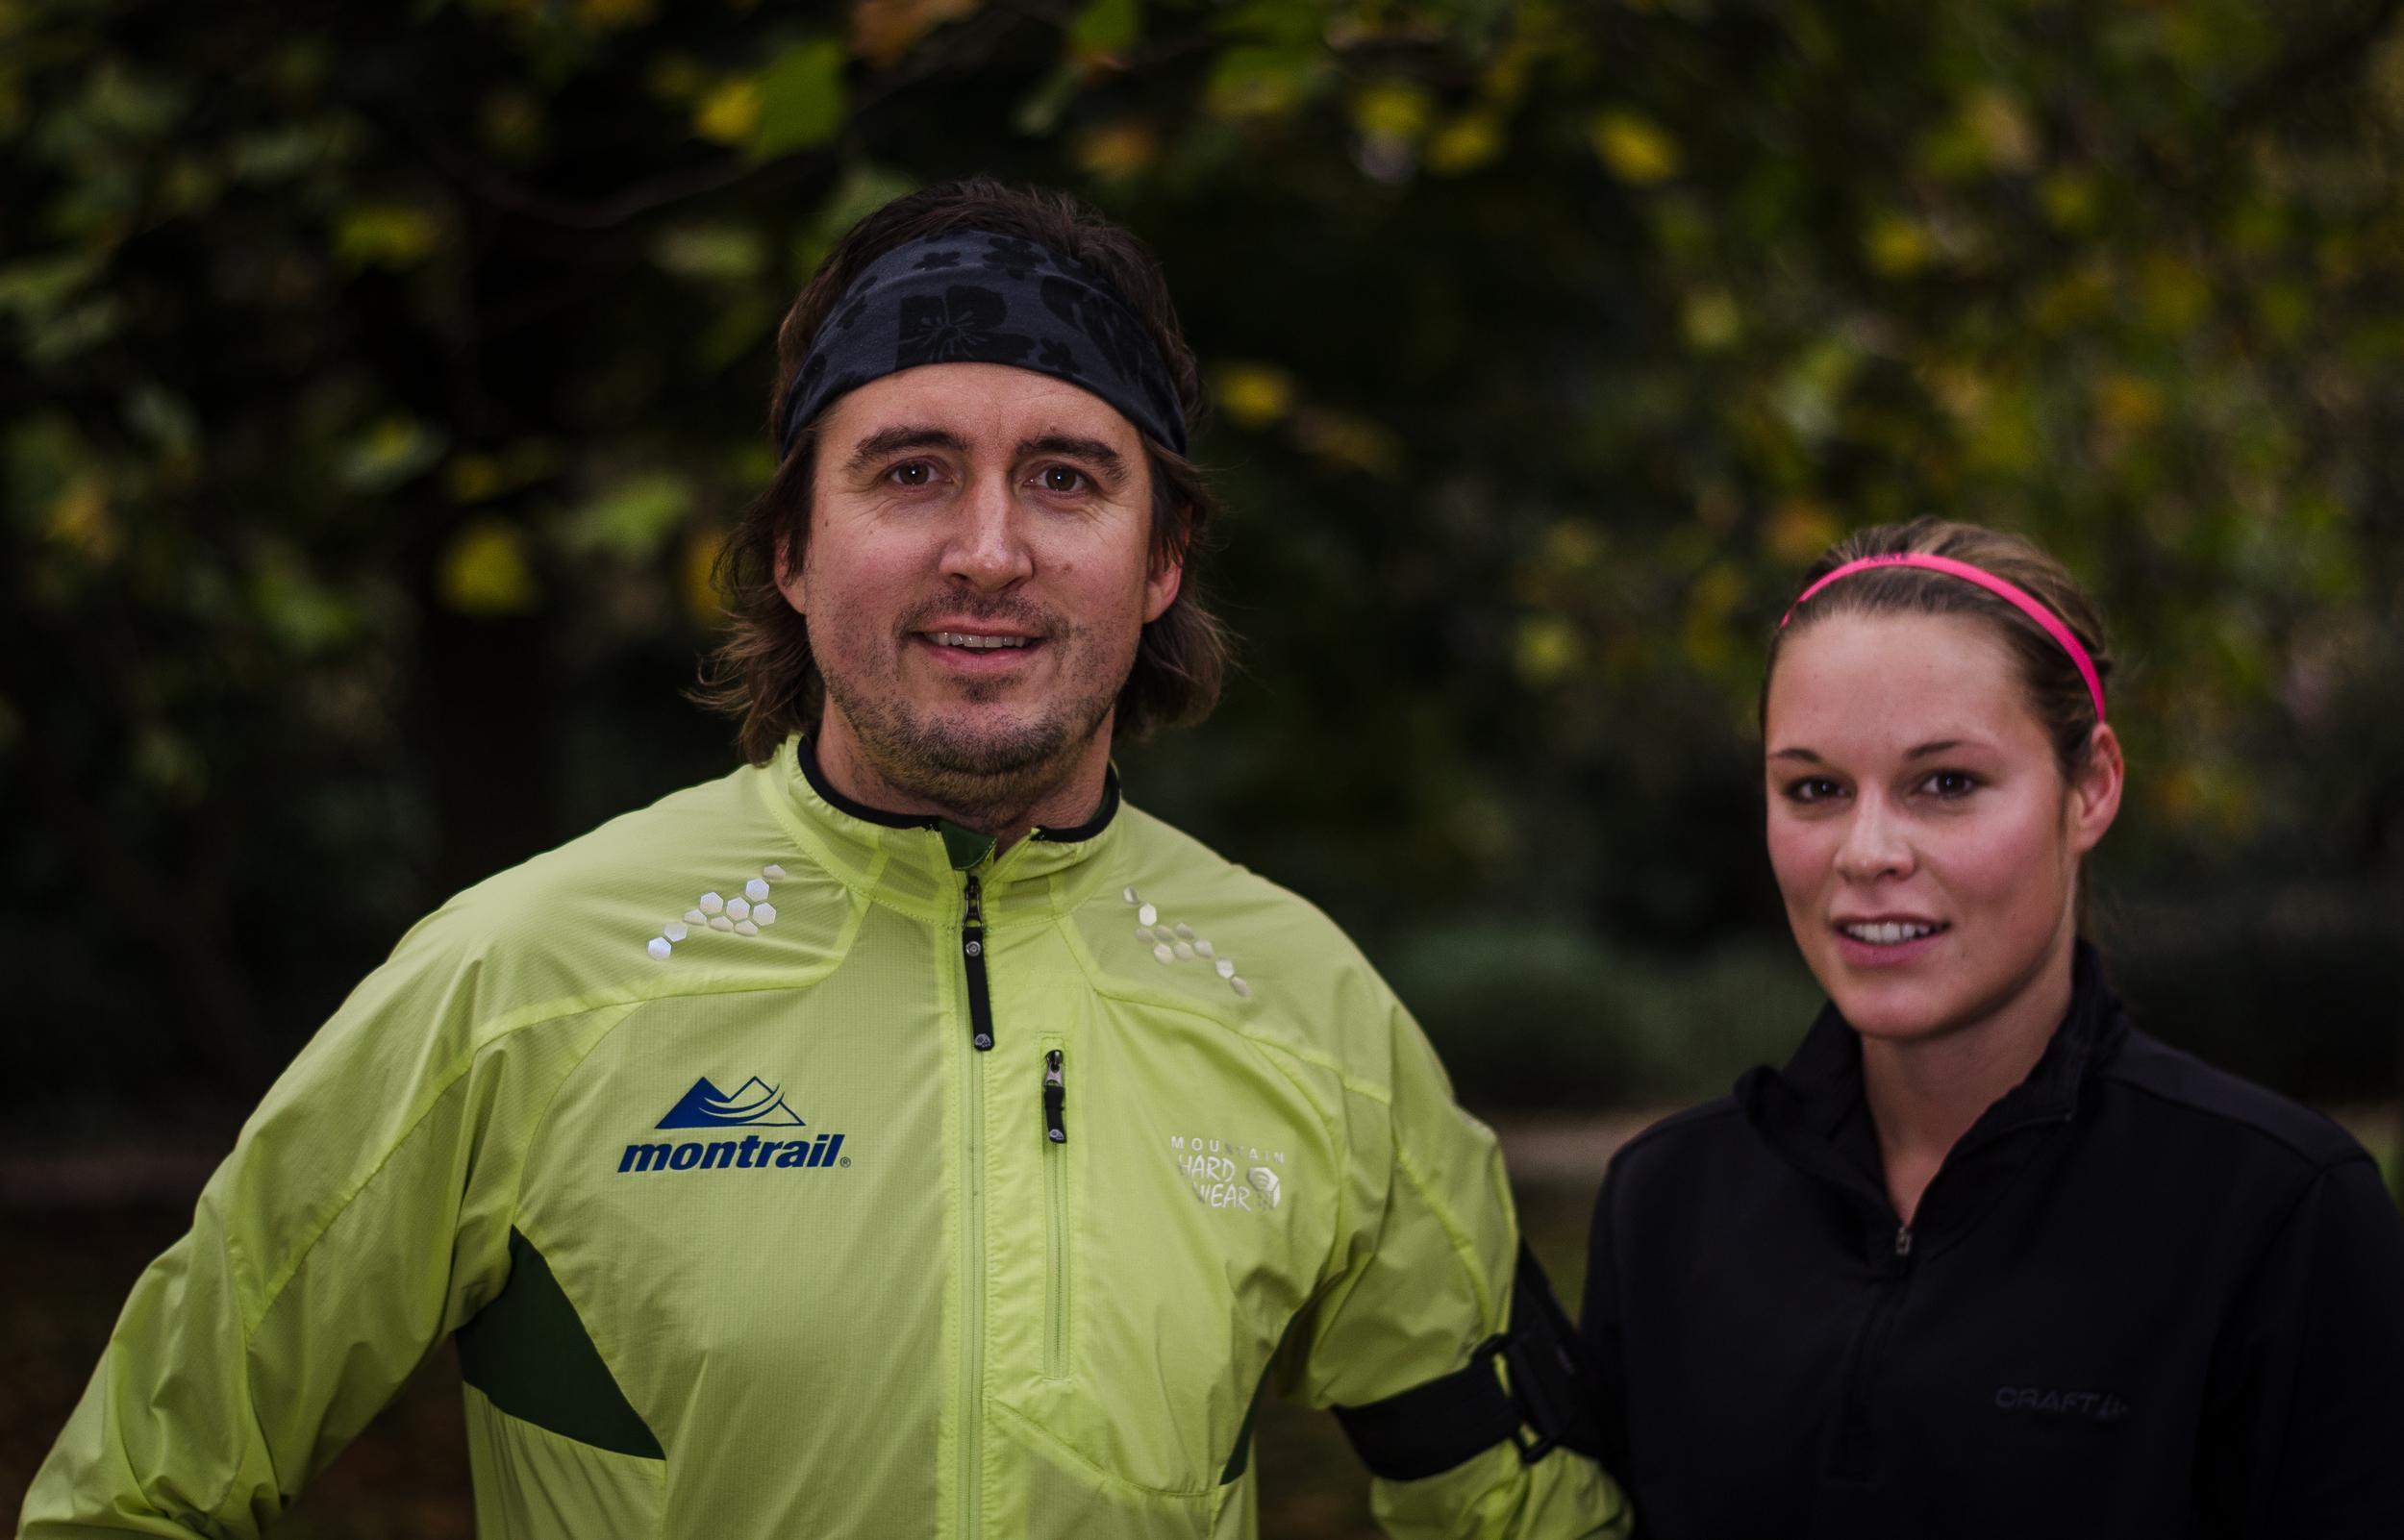 We Run - Portraits of the running community in London